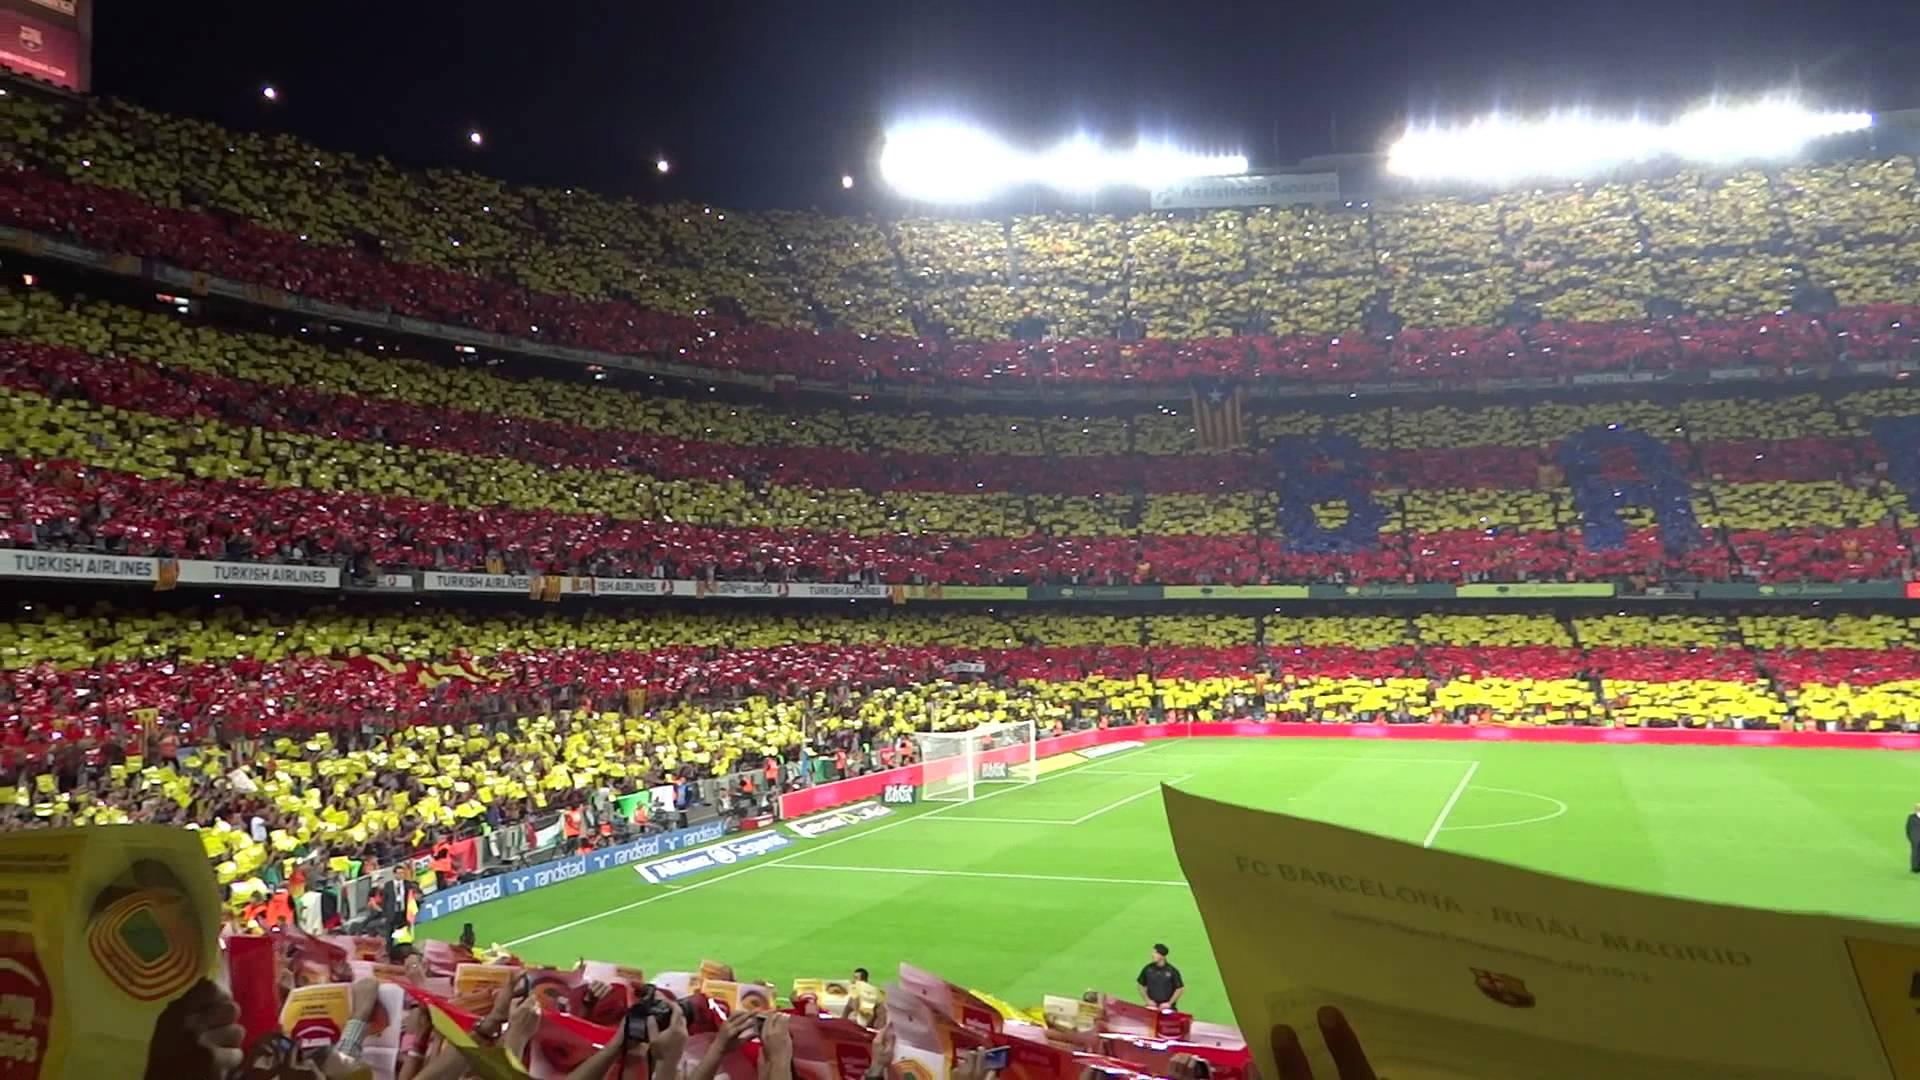 Real Madrid Desktop Wallpaper Hd Camp Nou Stadium Wallpaper Download Free Pixelstalk Net